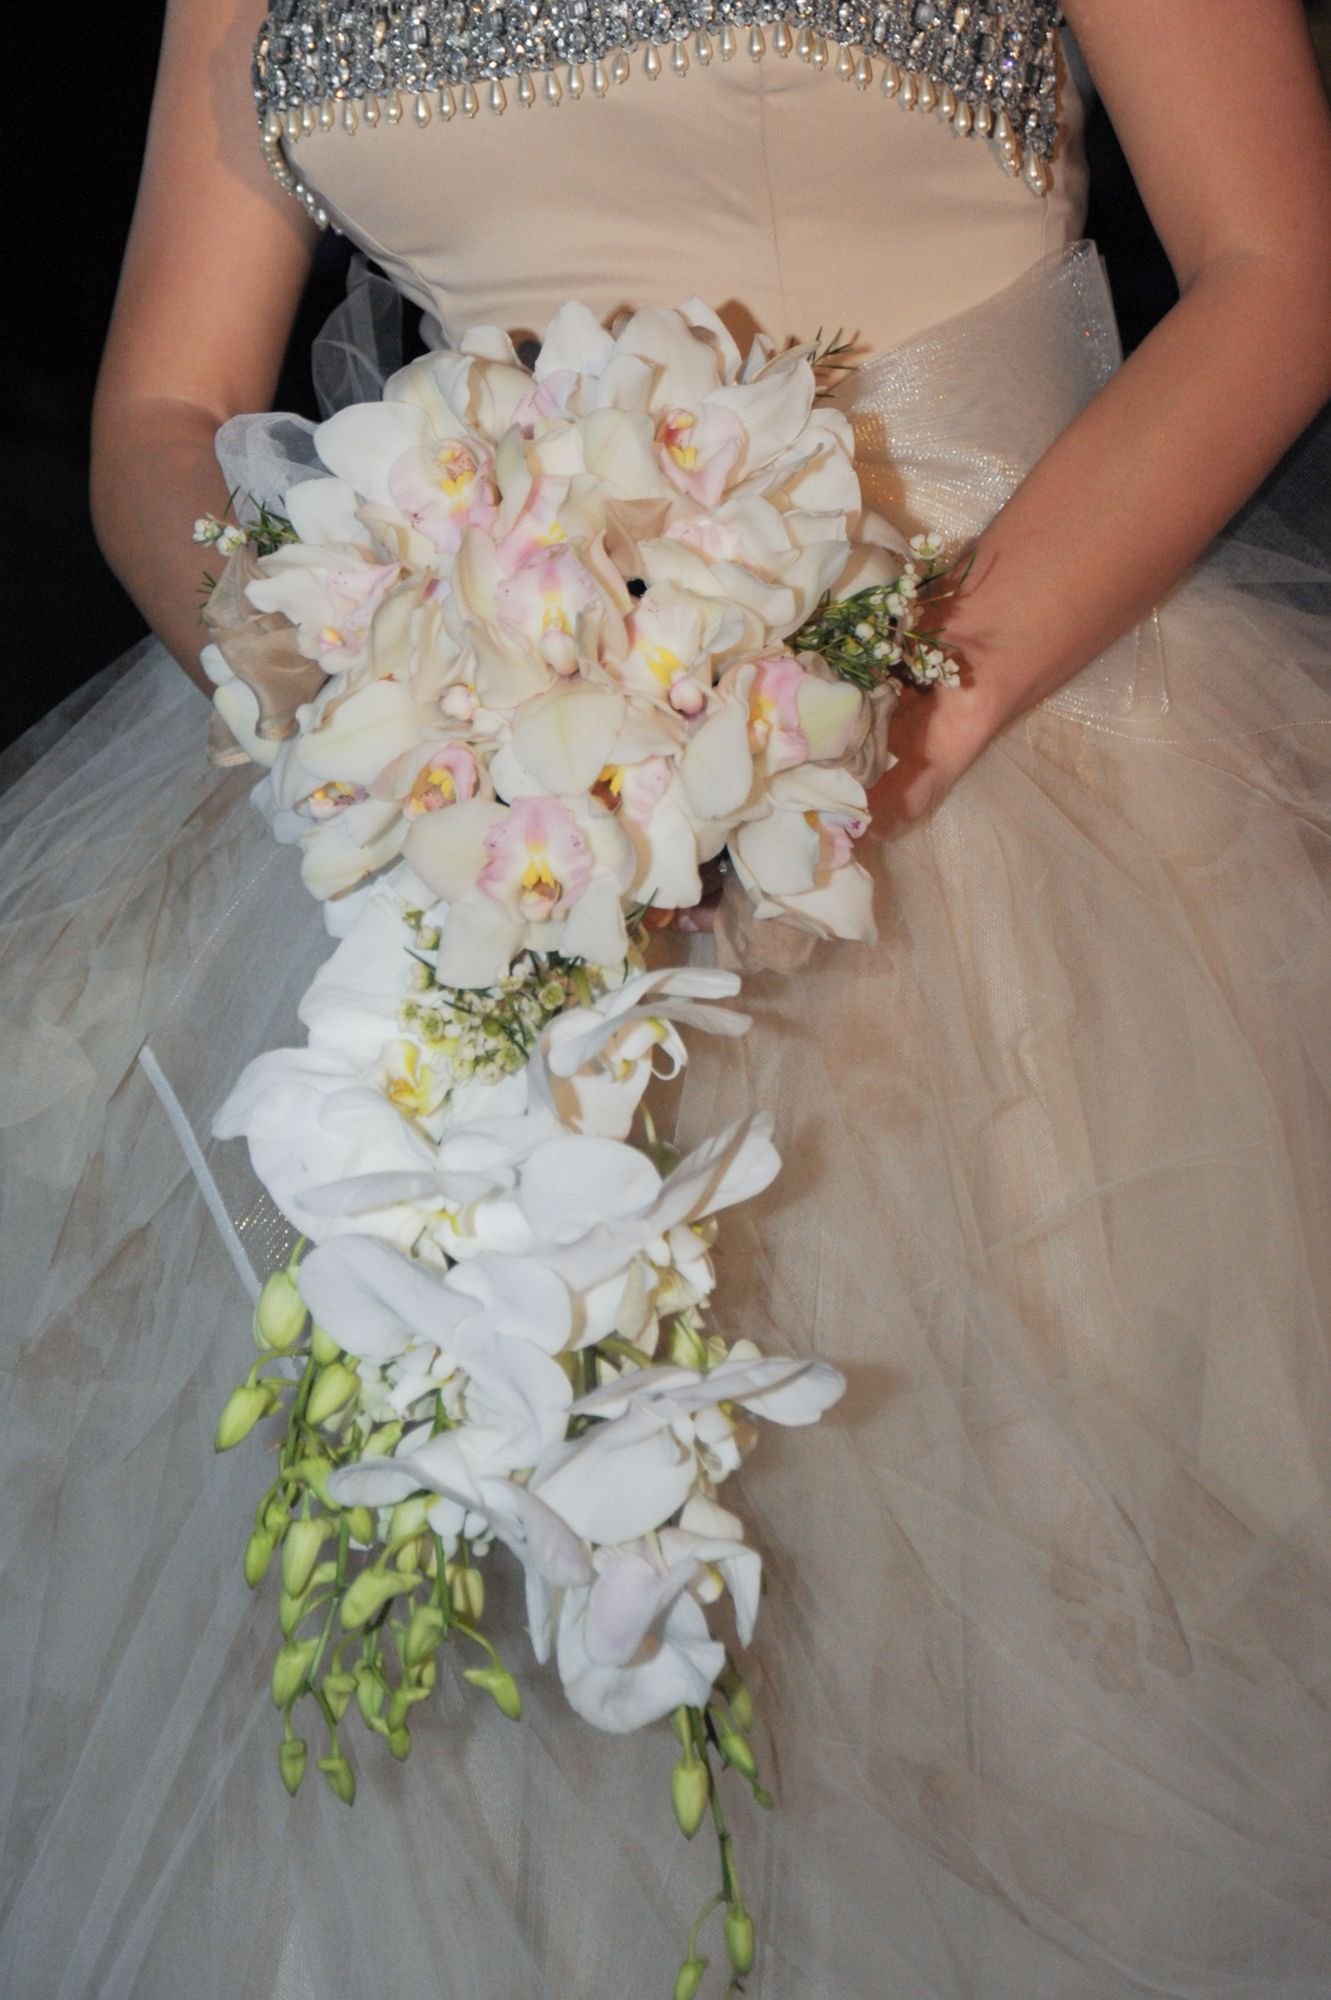 Floral Design, Decor & Centerpieces: Bridal Bouquet by MME Event Design & Productions. mmeentertainment.com. Call us now: 877.885.0705 | 212.971.5353